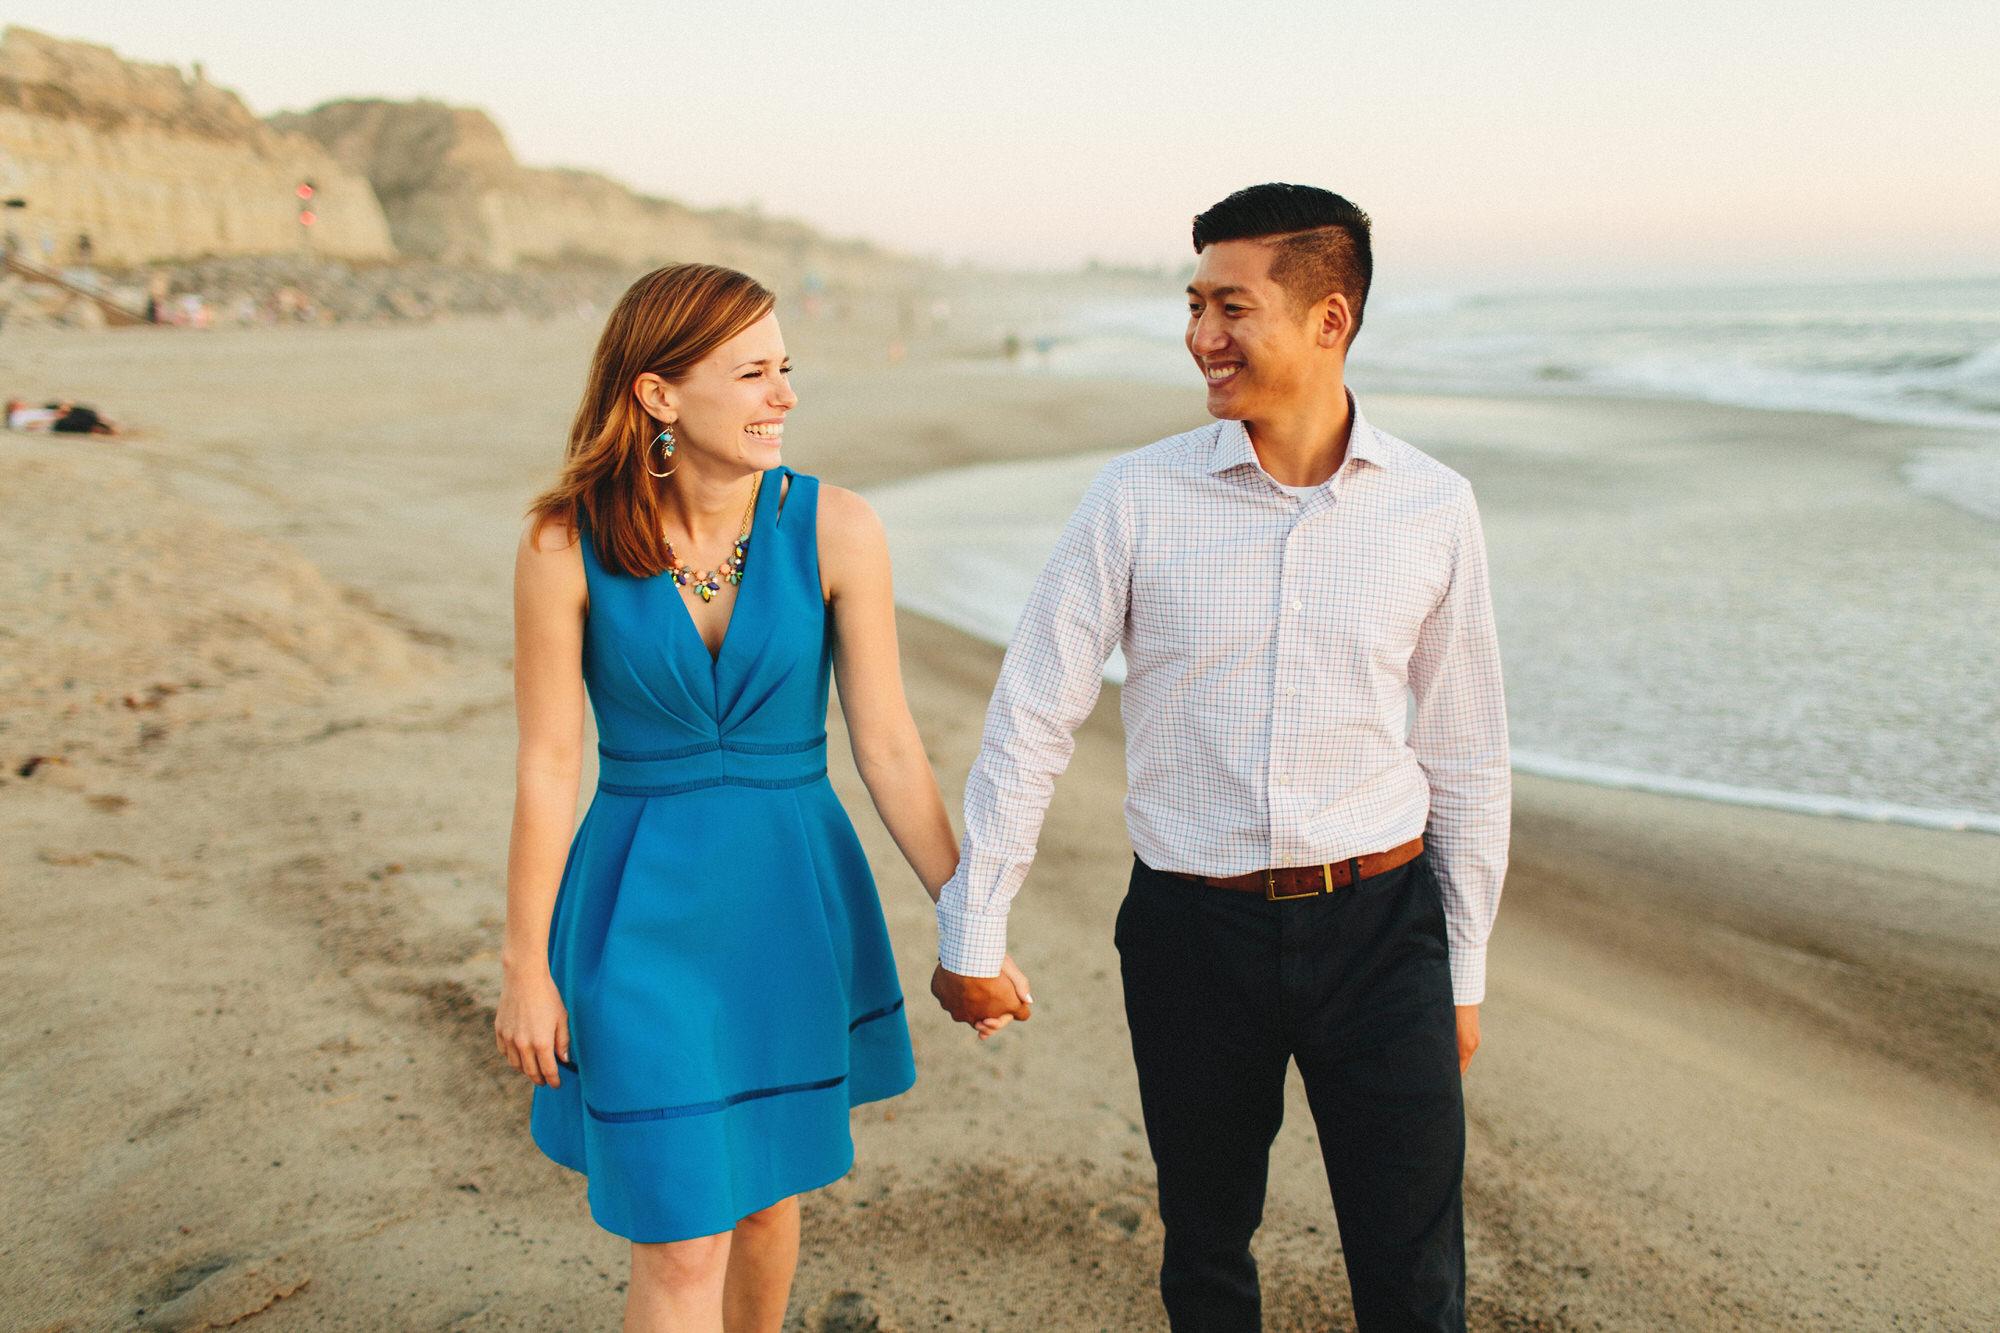 San-Clemente-engagement-18.jpg